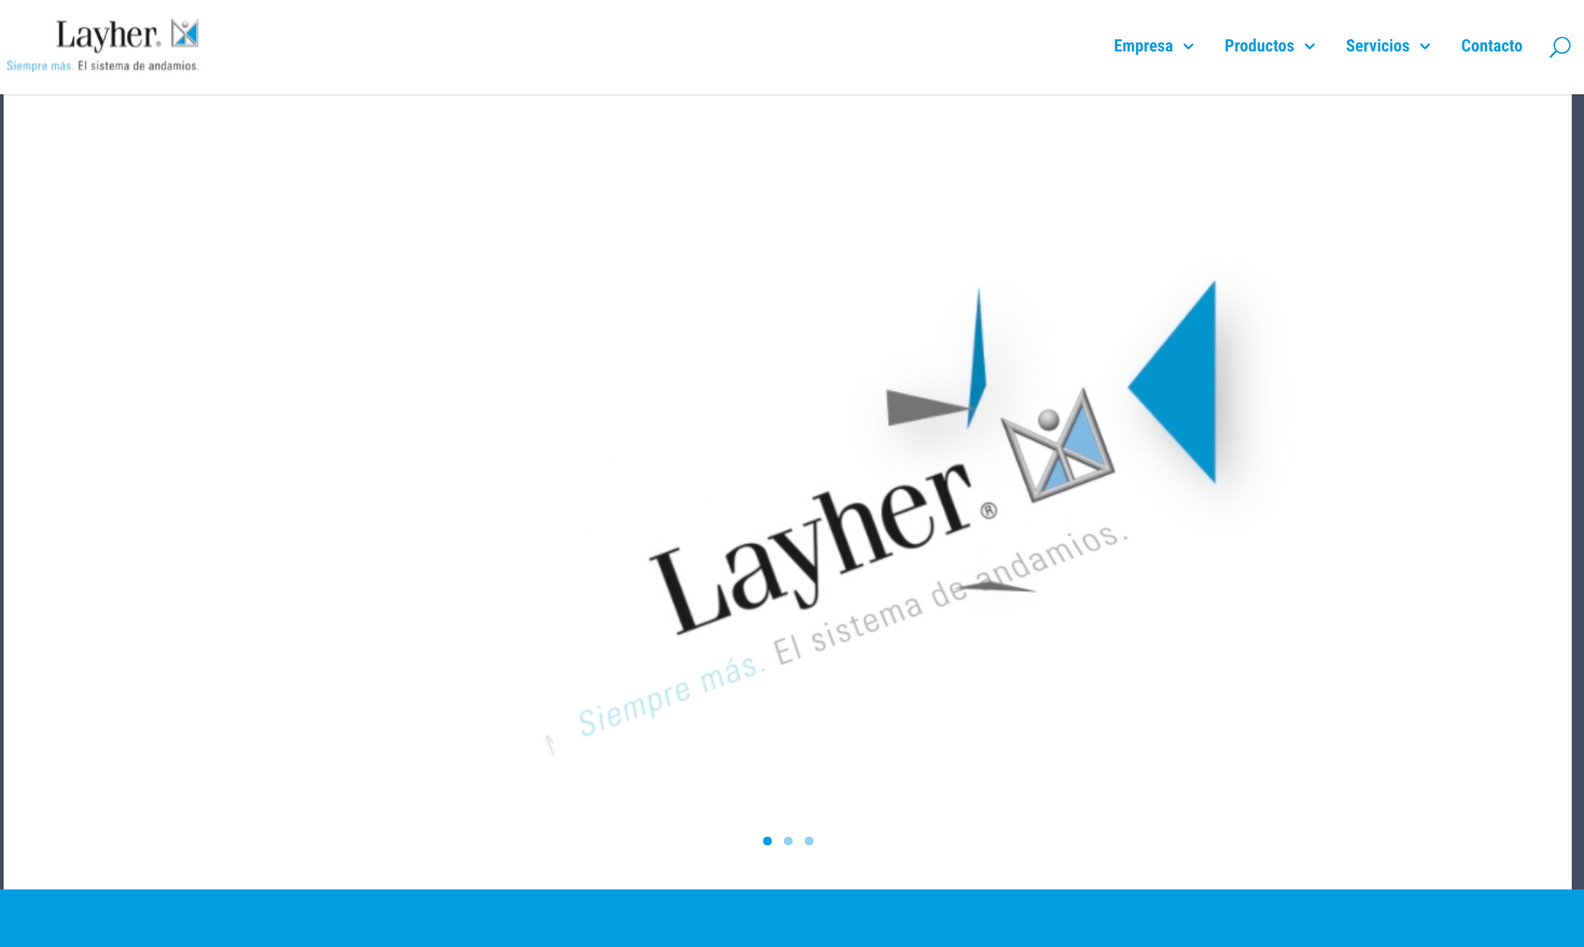 Web Layher Ecuador